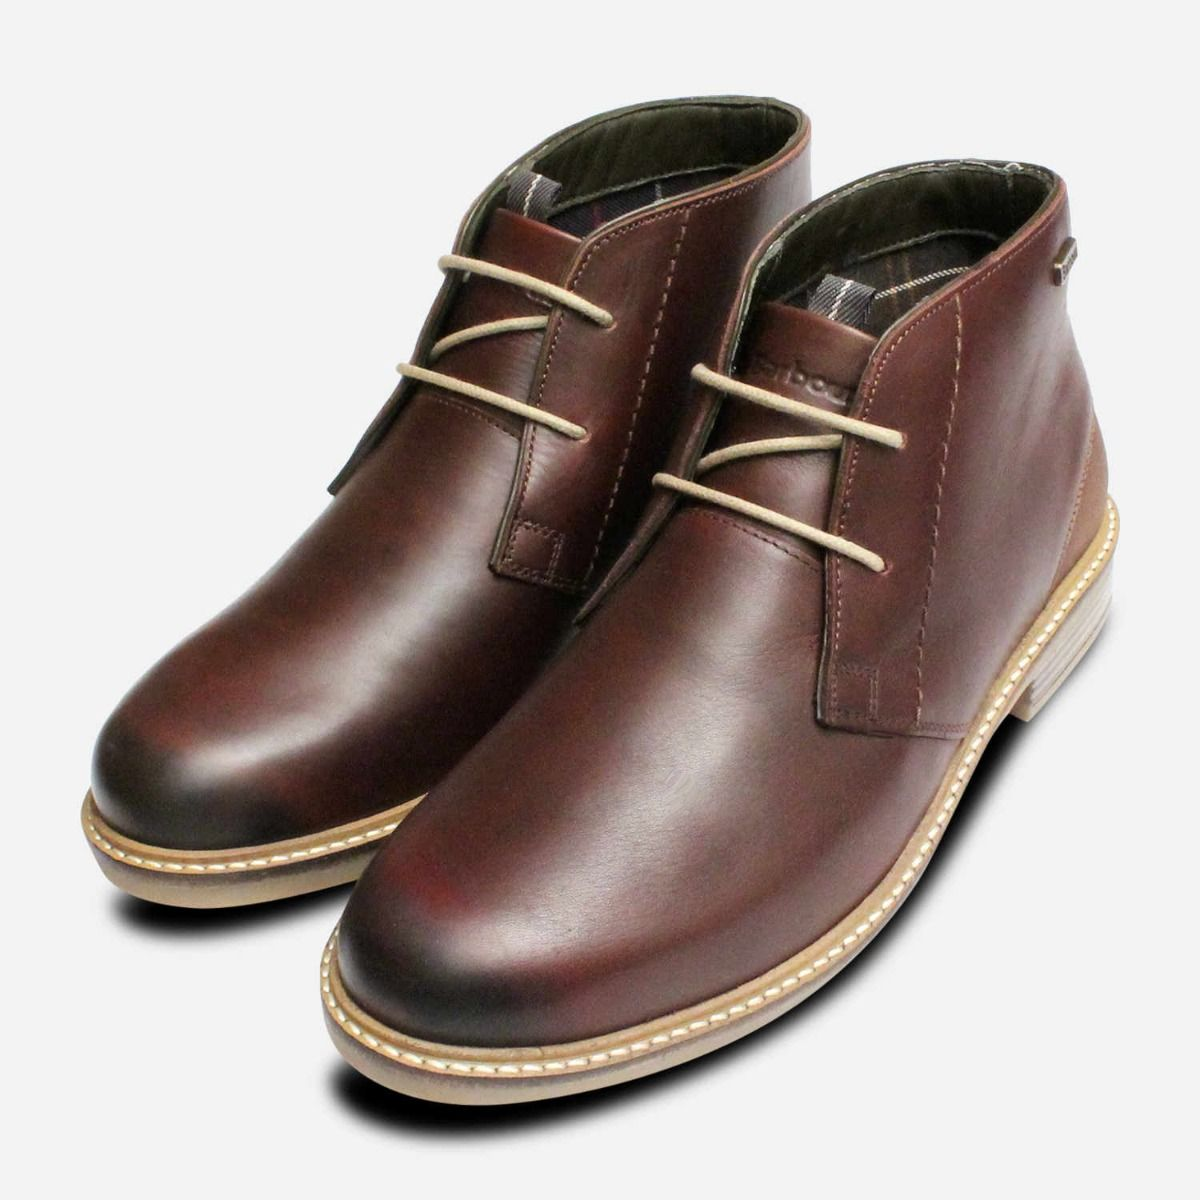 598d7f47a2f Barbour Readhead Waxy Dark Brown Mens Lace Up Boot